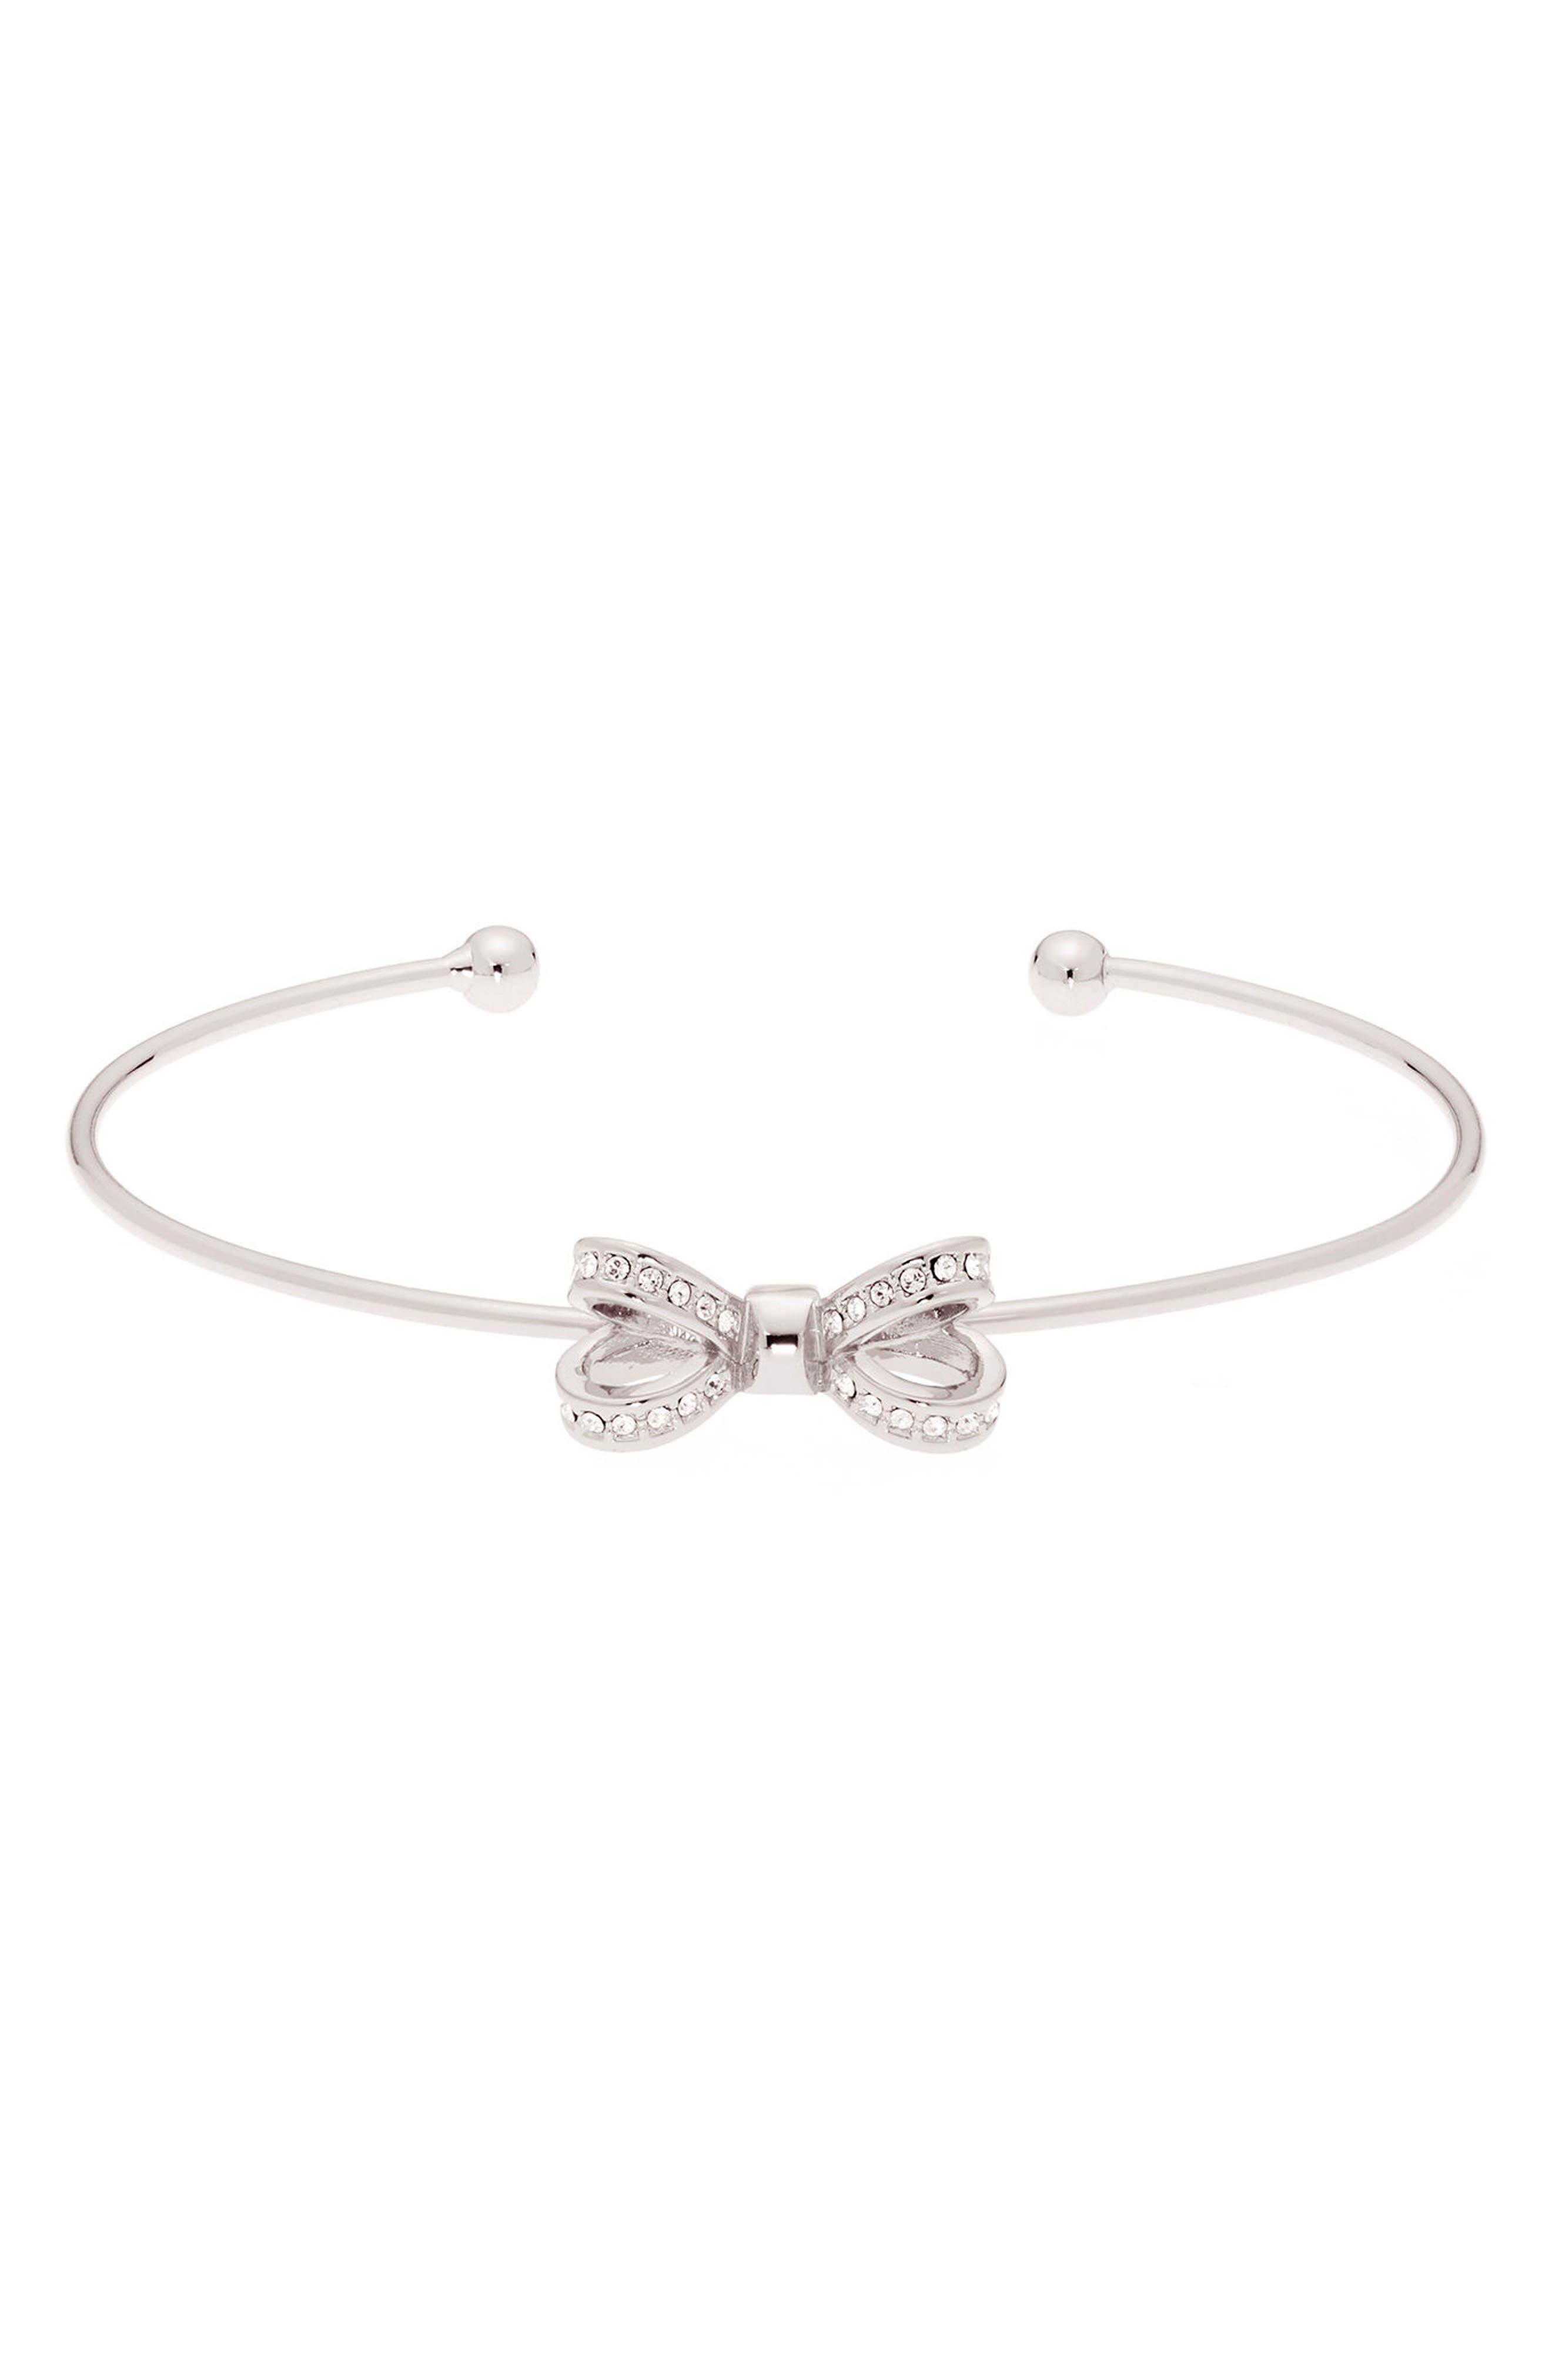 Main Image - Ted Baker London Mini Opulent Pavé Bow Cuff Bracelet